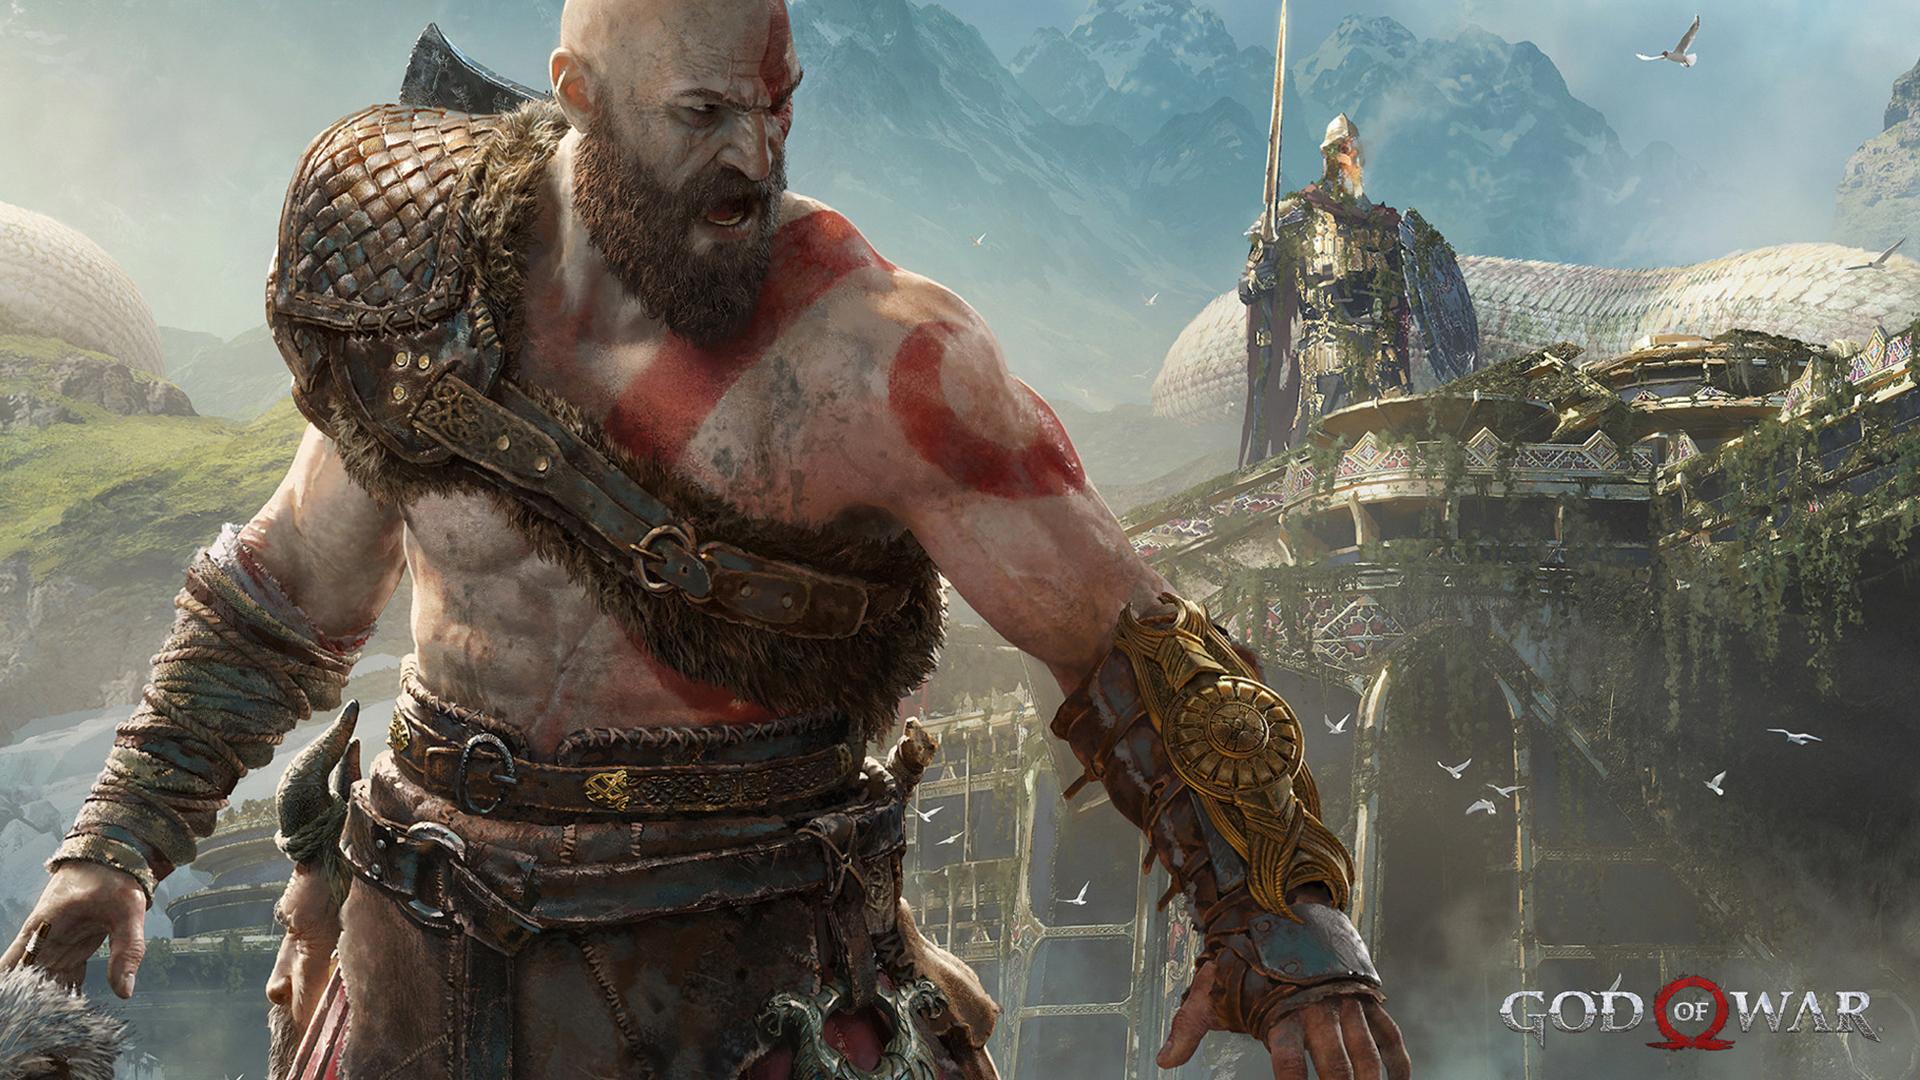 God Of War Kratos Wallpapers Wallpapers Hd